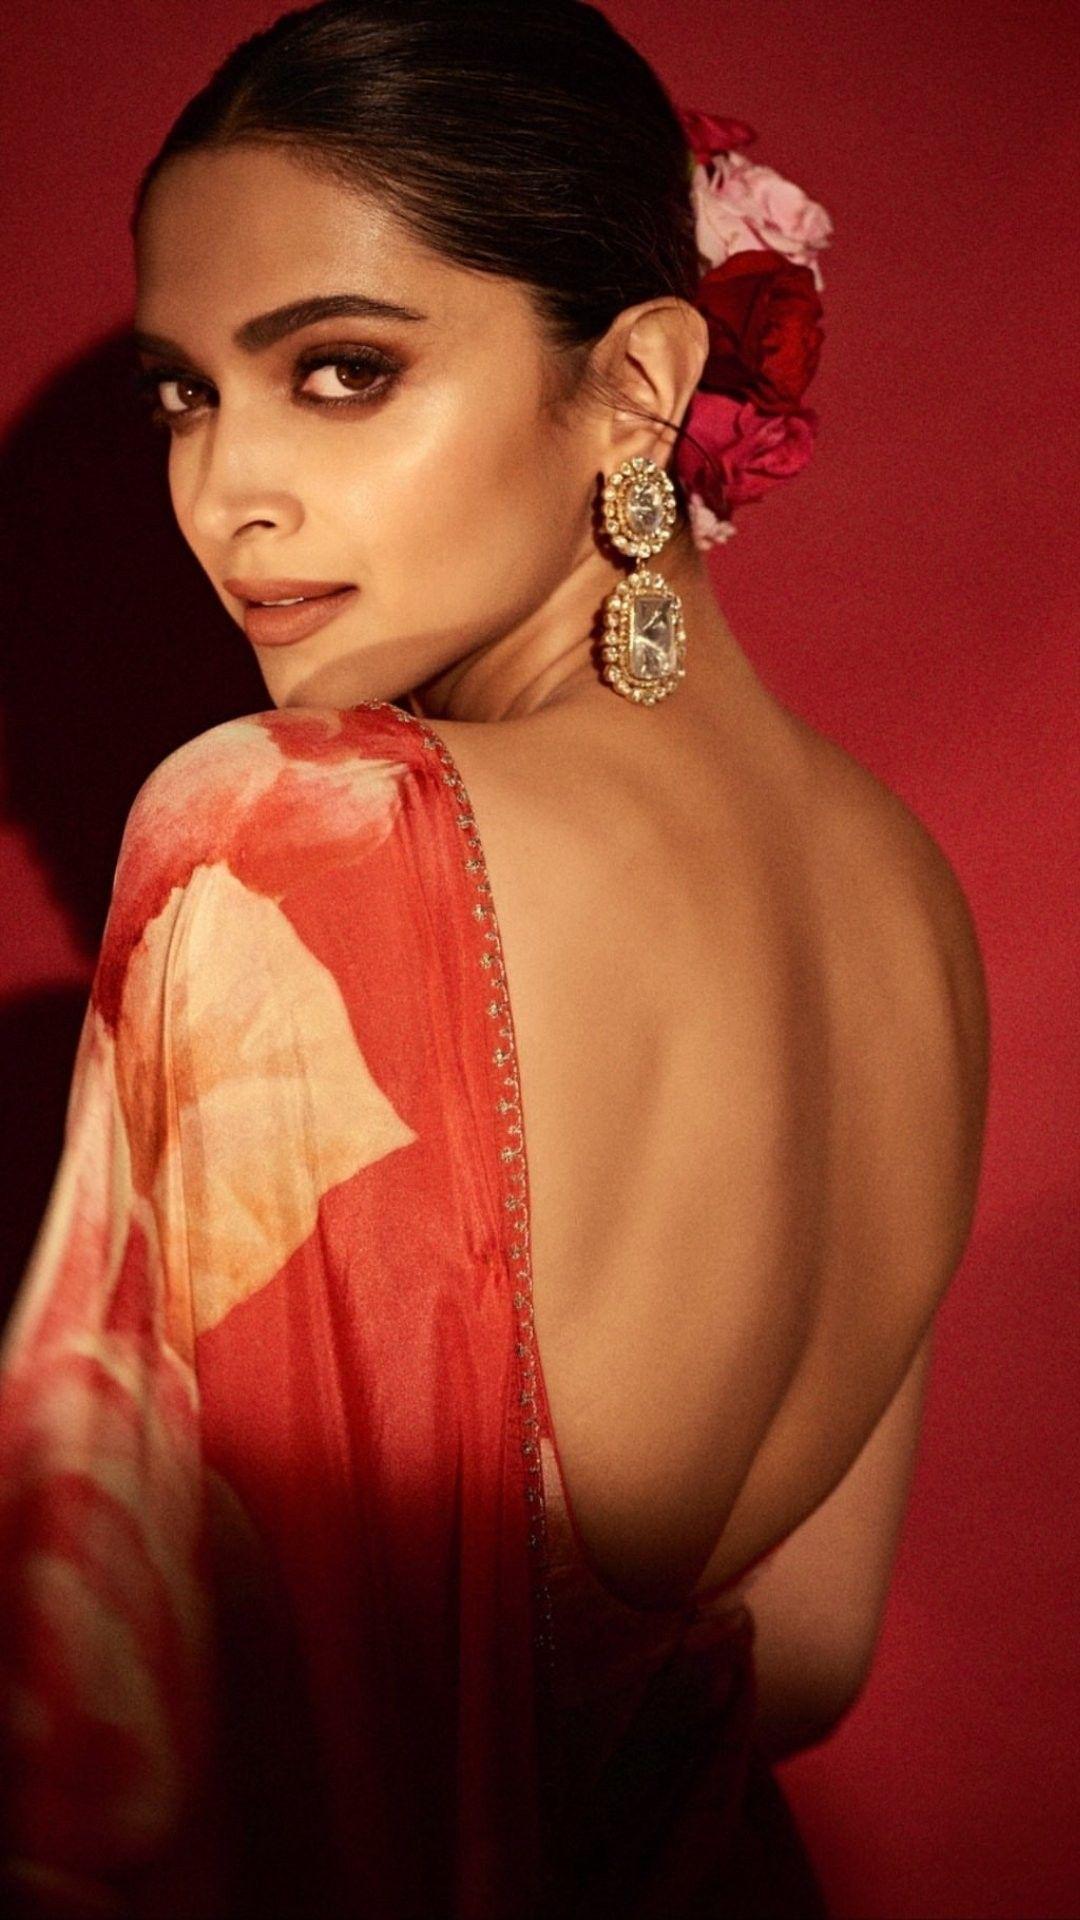 Pin By Aarti Singh On Deepika Padukone Style Deepika Padukone Style Deepika Padukone Indian Actress Hot Pics